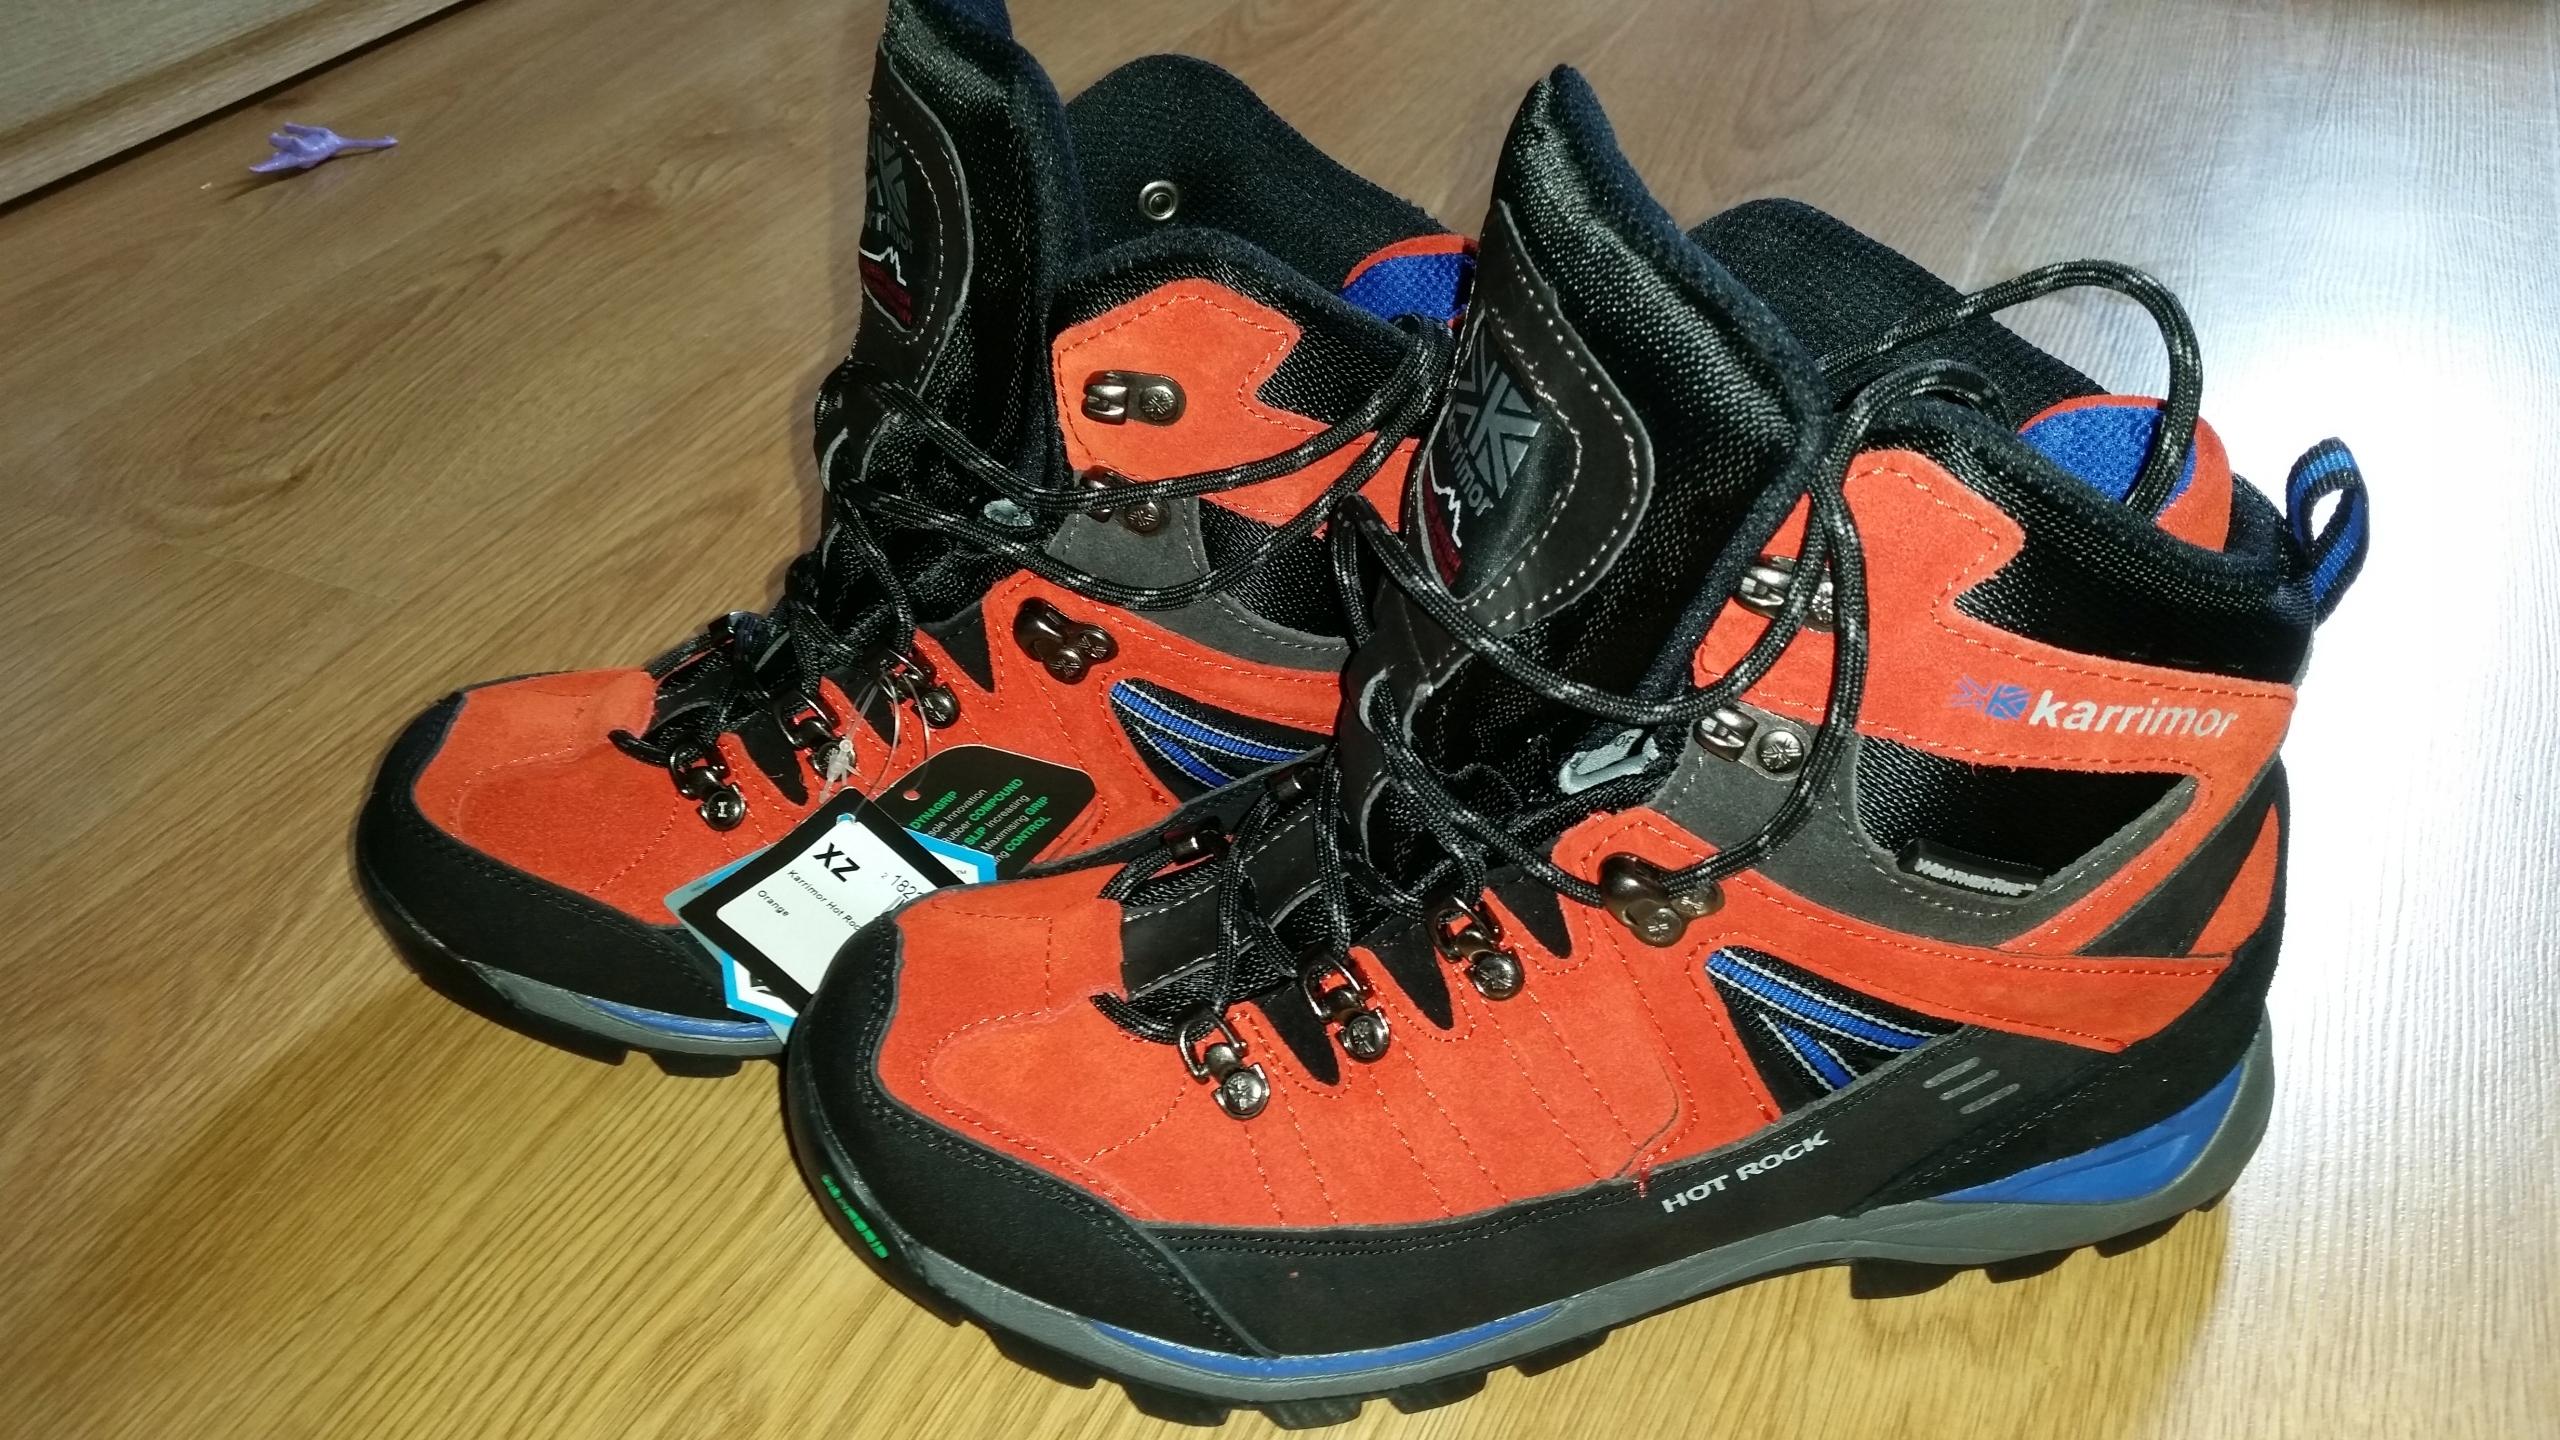 07e62b53 Buty trekkingowe Karrimor hot rock roz 41 - 7546859991 - oficjalne ...